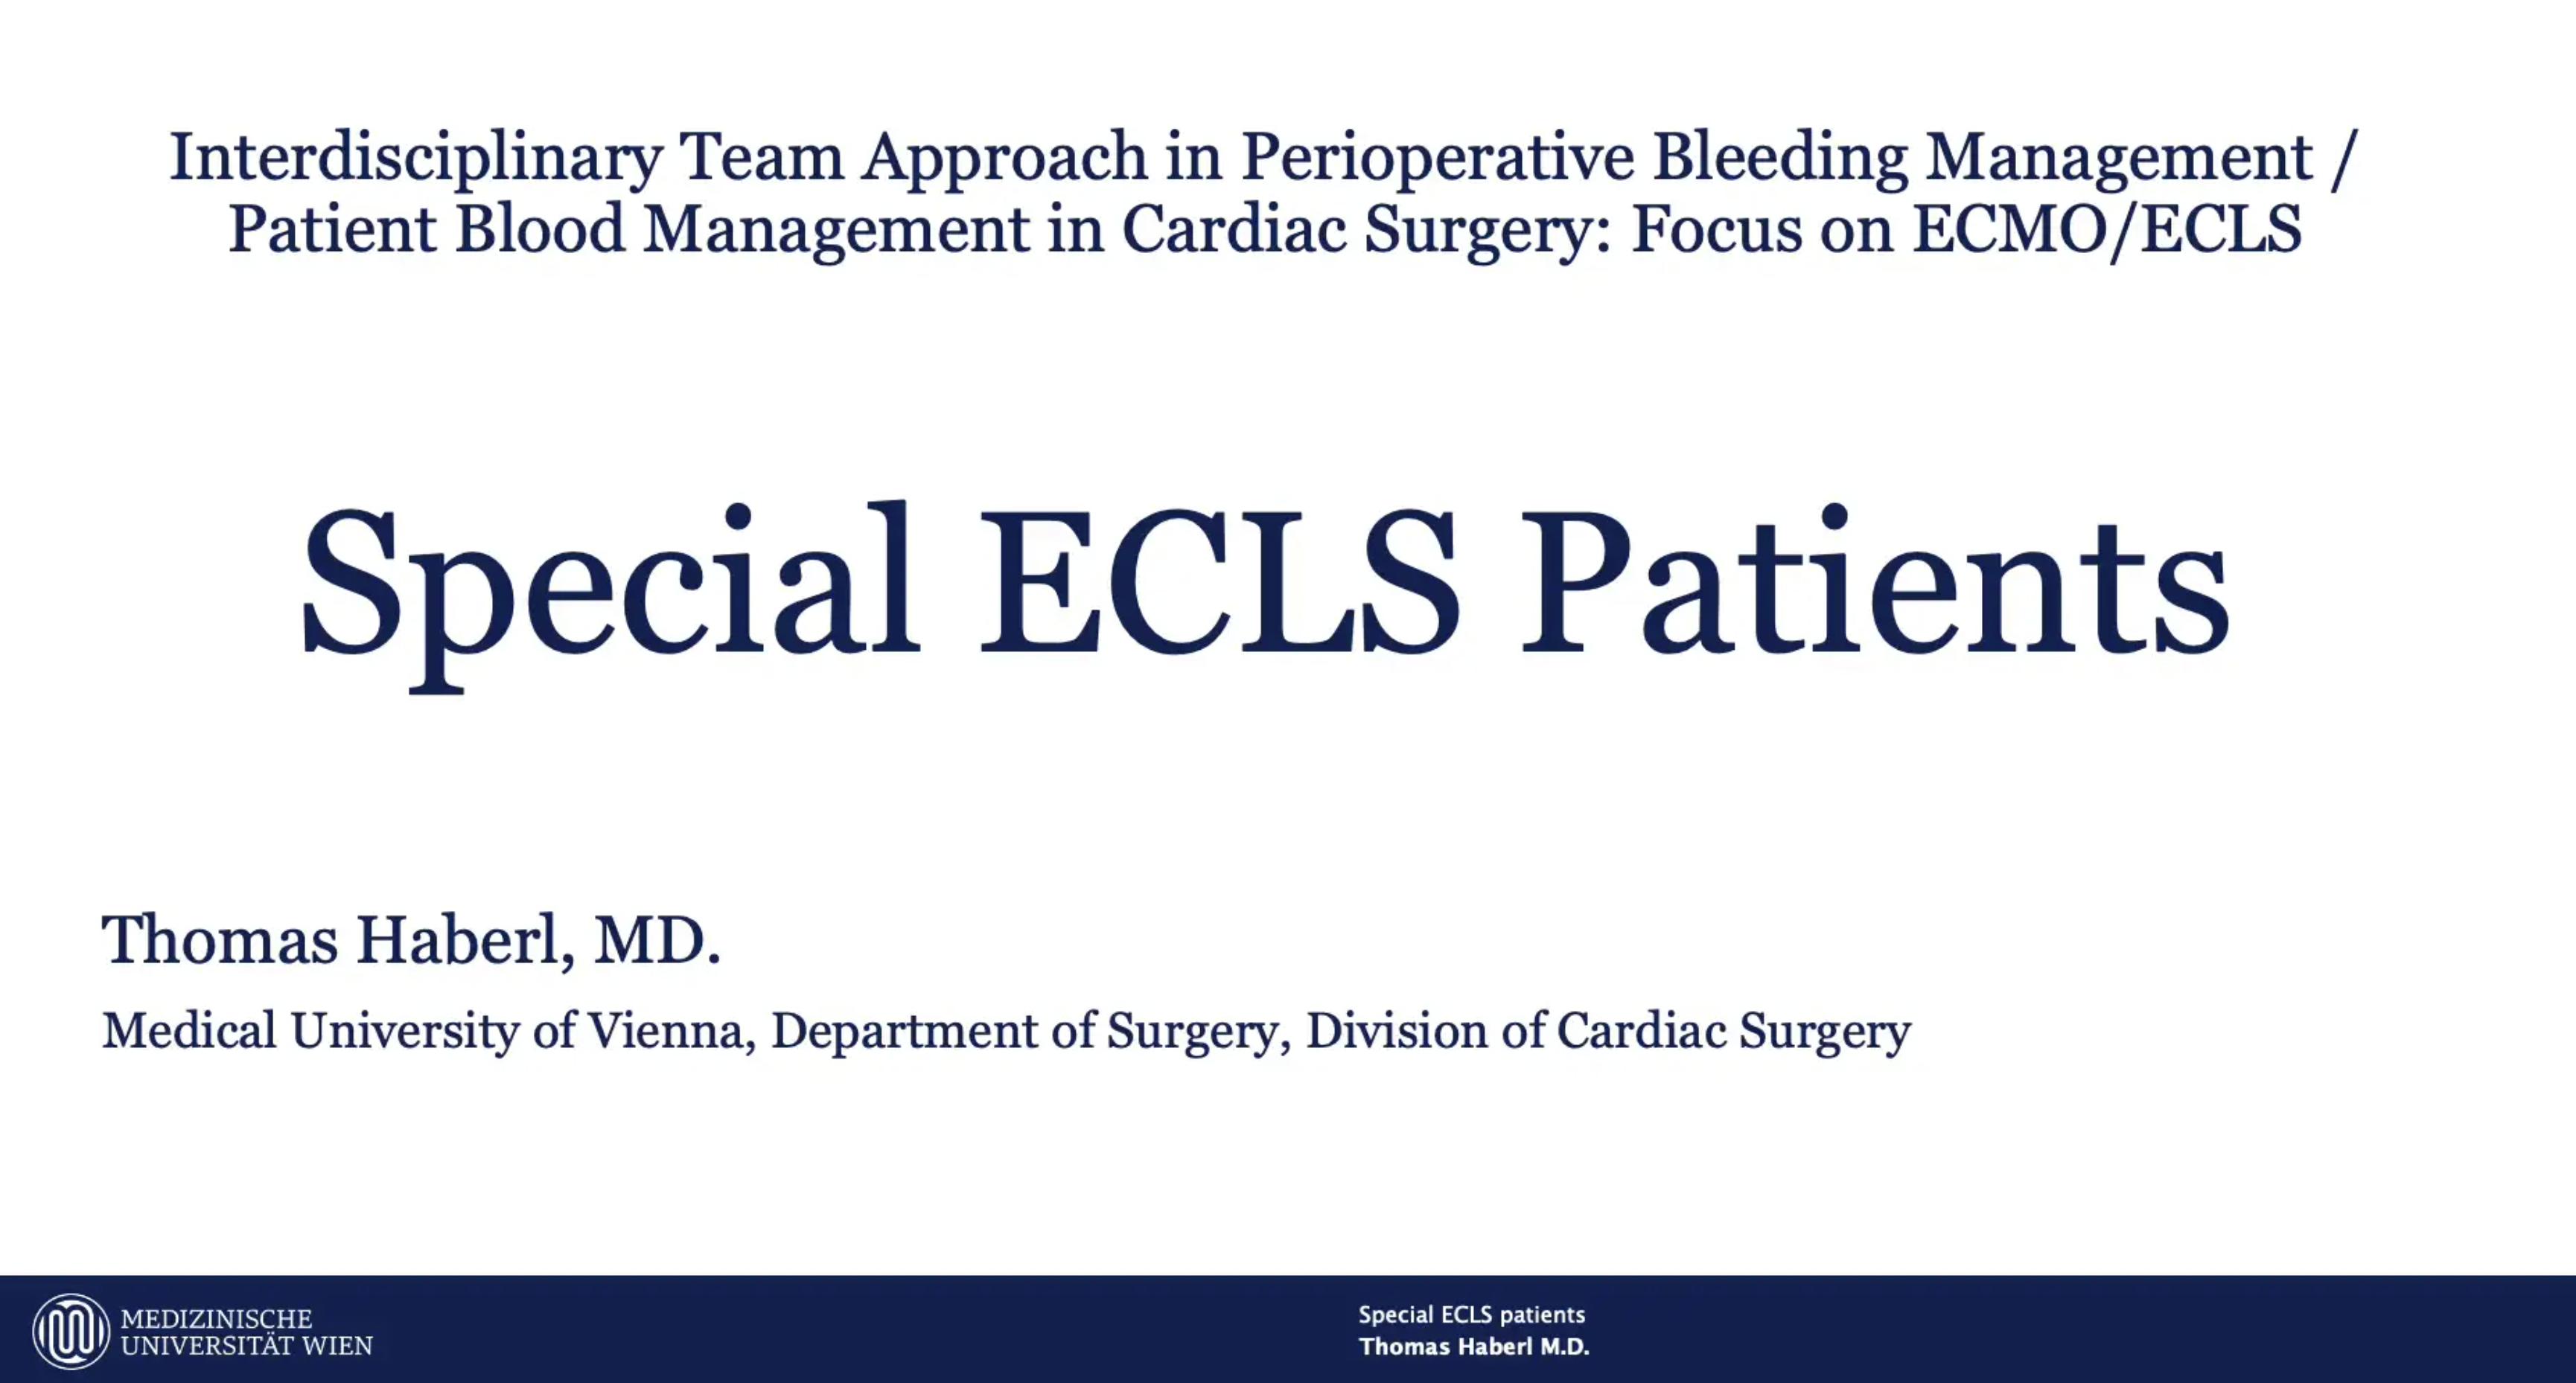 pob-pbm-in-ecmo-special-ecls-patients